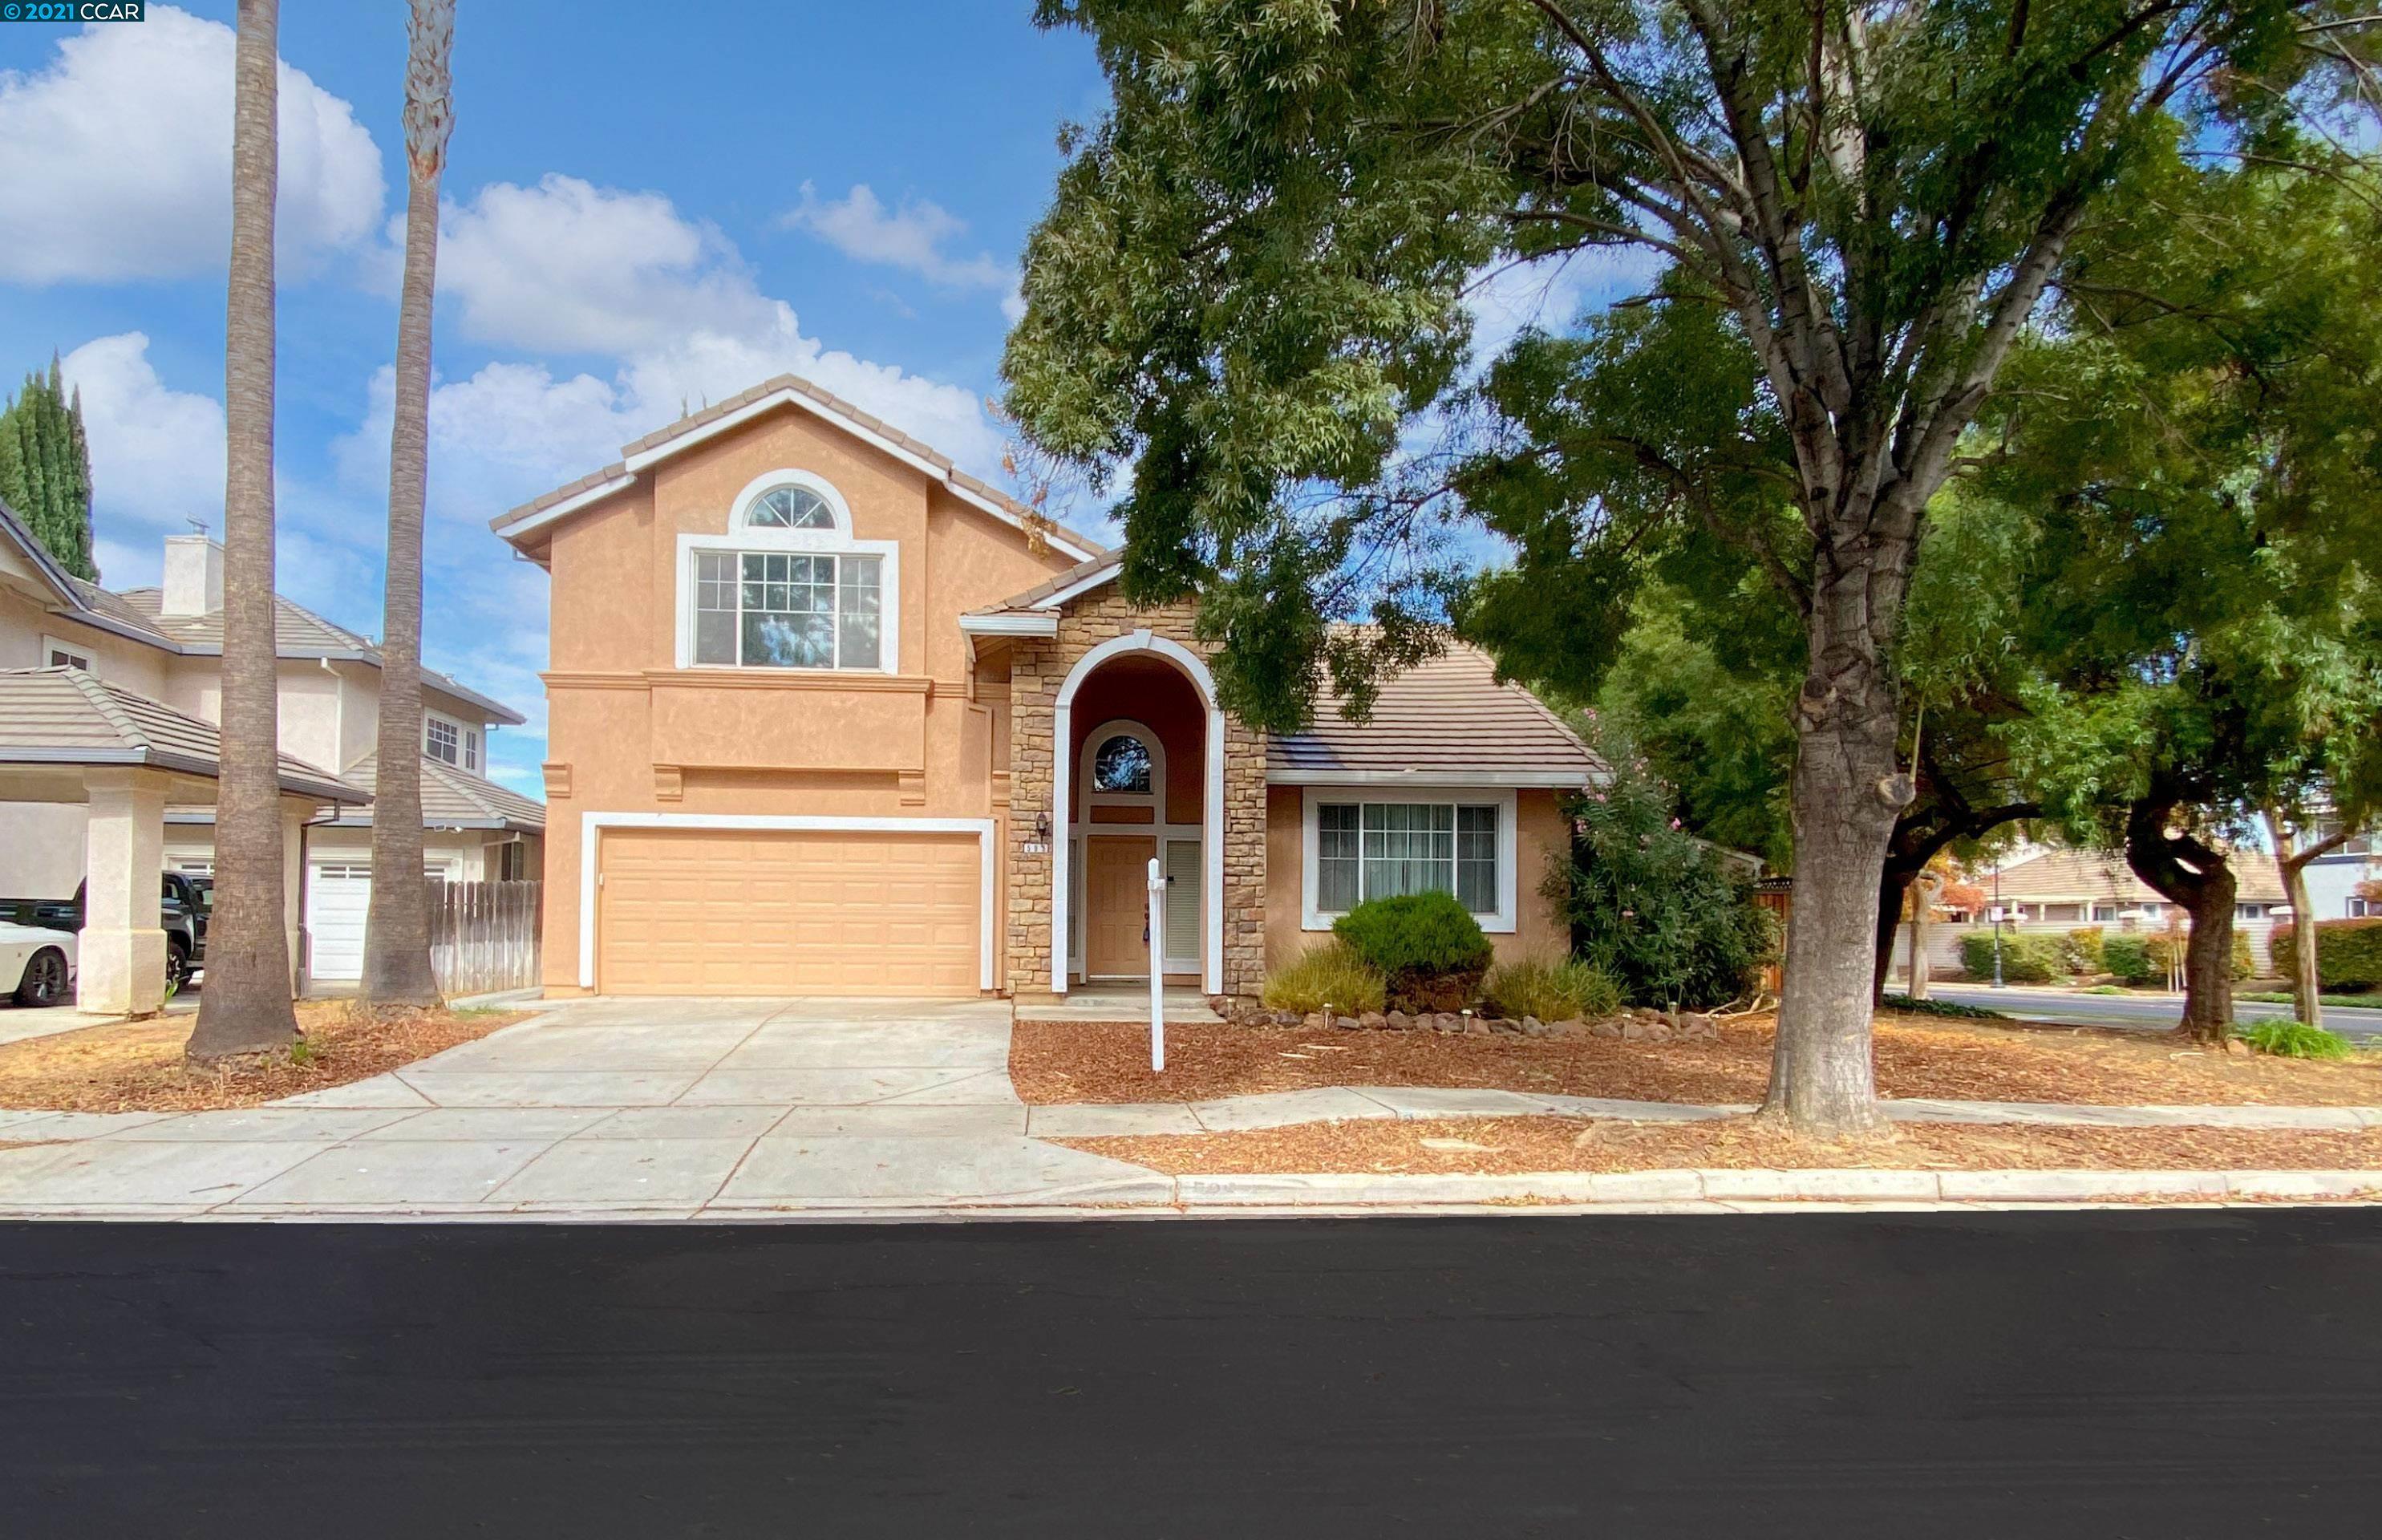 595 Birchwood Rd, BRENTWOOD, CA 94513